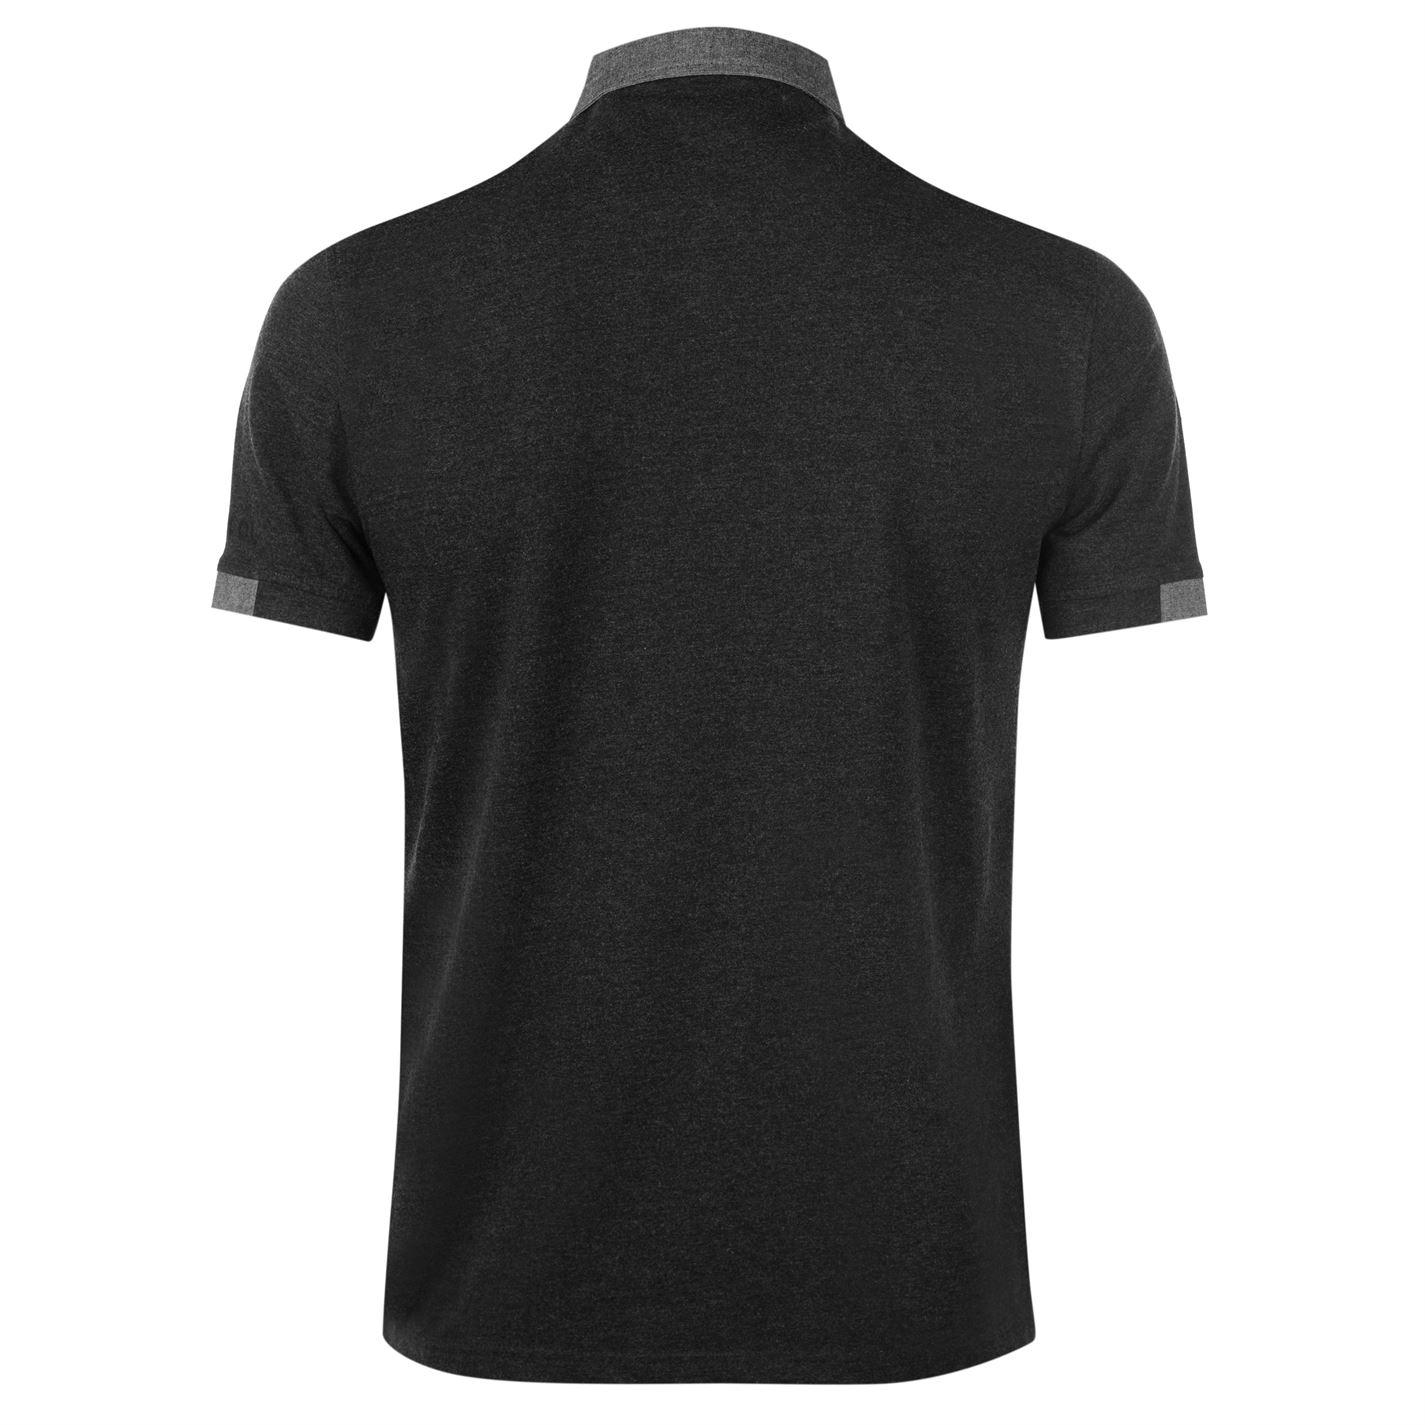 Kangol-Mens-Cham-Short-Sleeve-Polo-Shirt-Classic-Fit-Tee-Top-Lightweight-Colour thumbnail 13